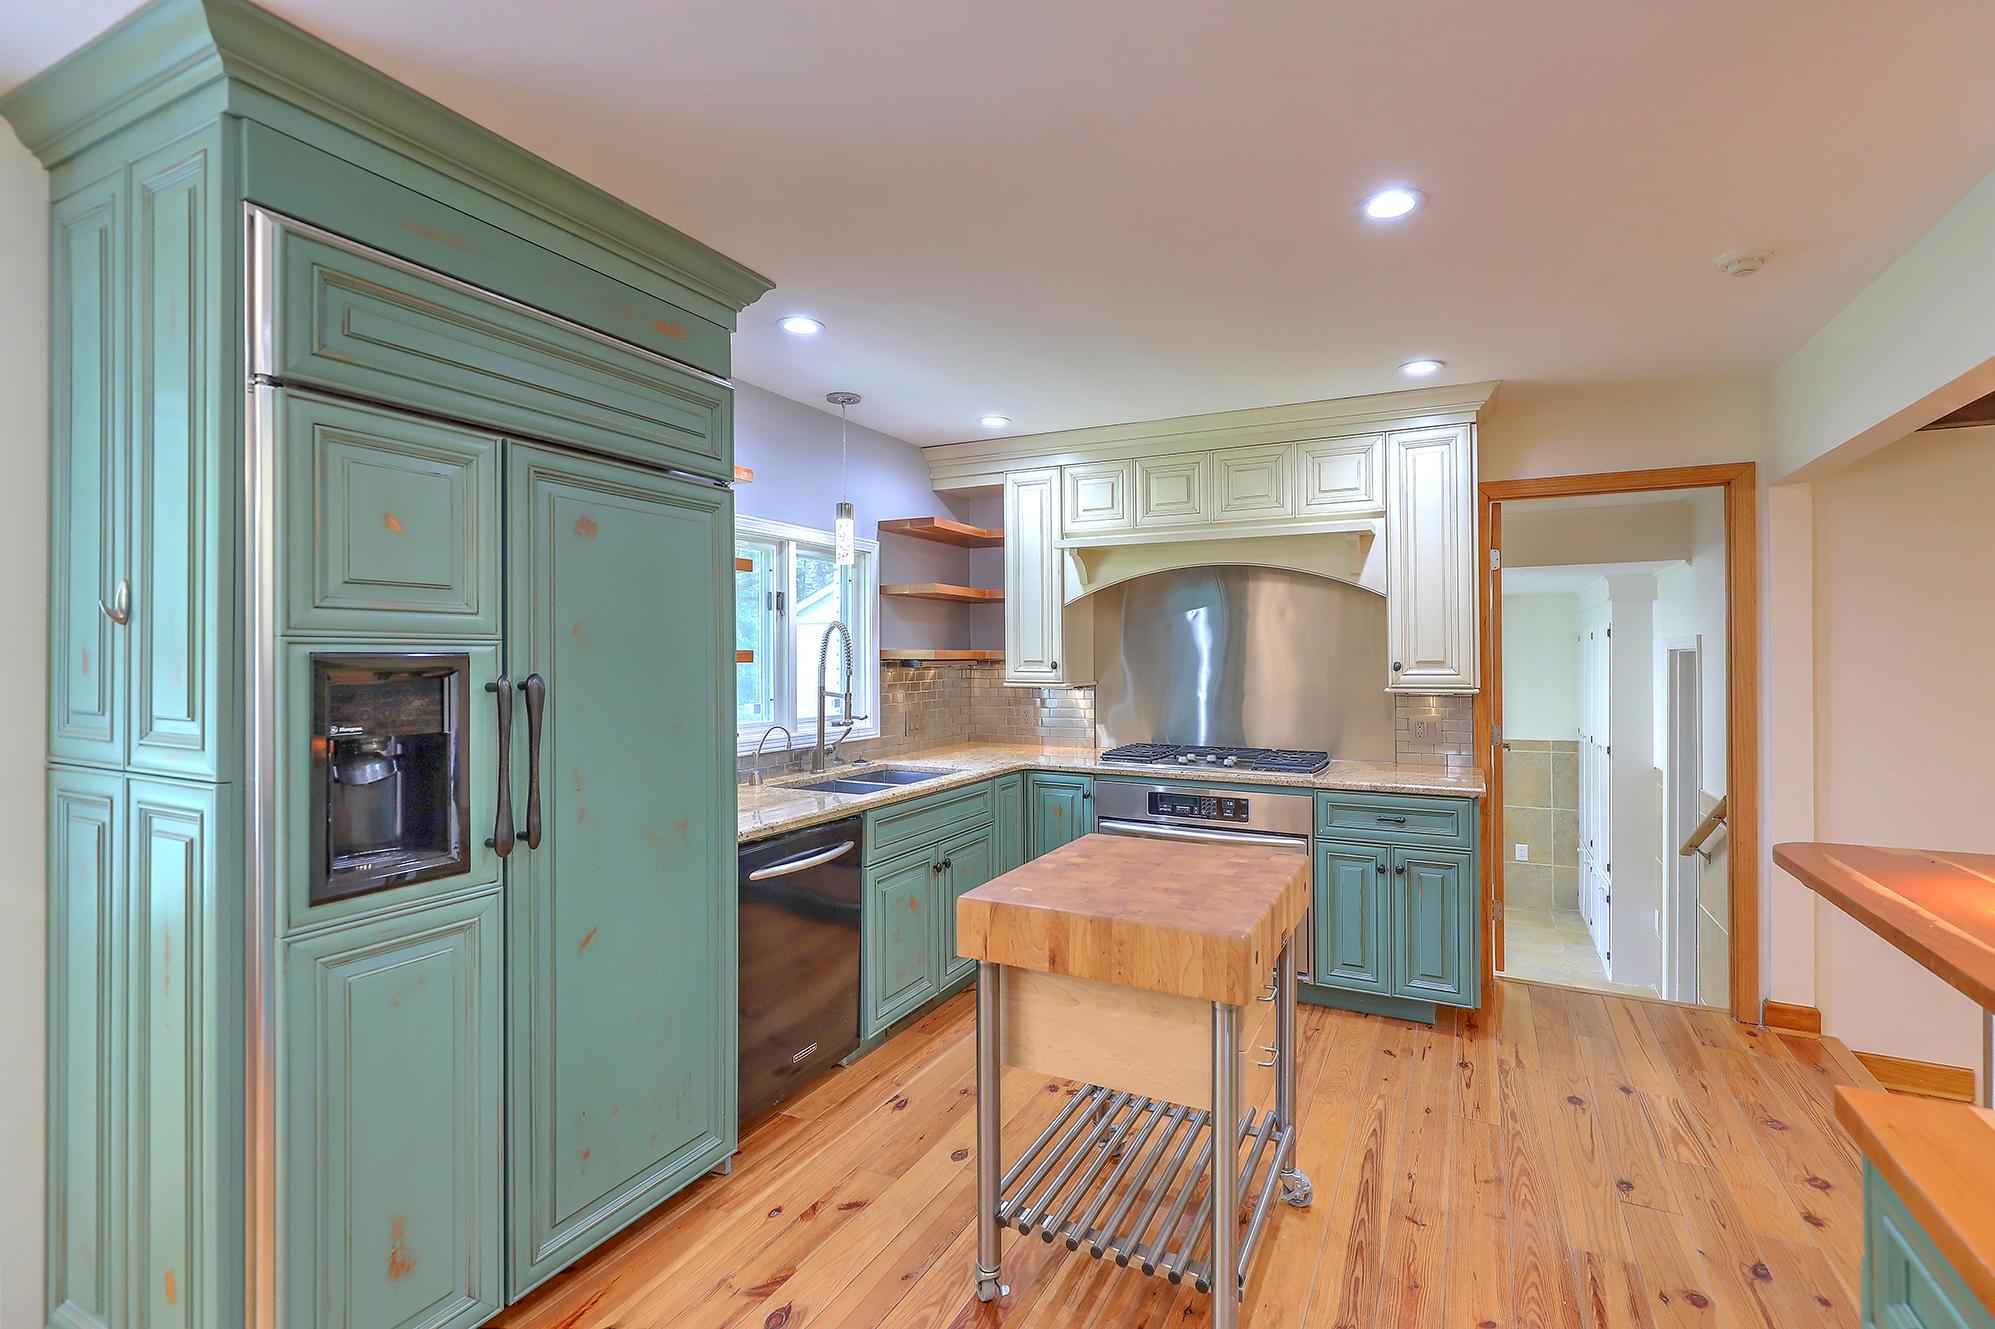 Edgewater Park Homes For Sale - 1413 Edsent, Charleston, SC - 1